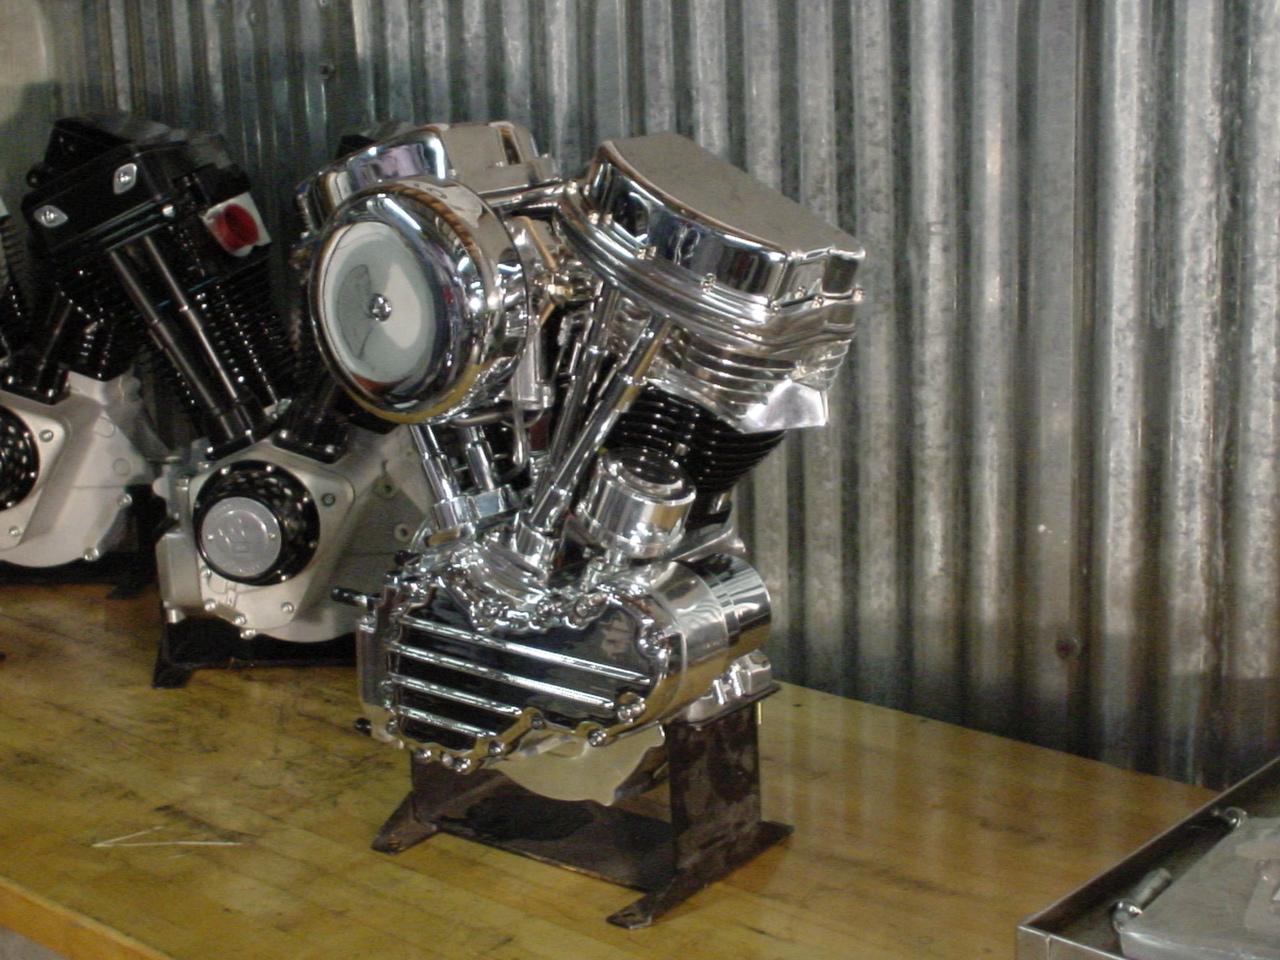 Accurate Engineering Panhead engine